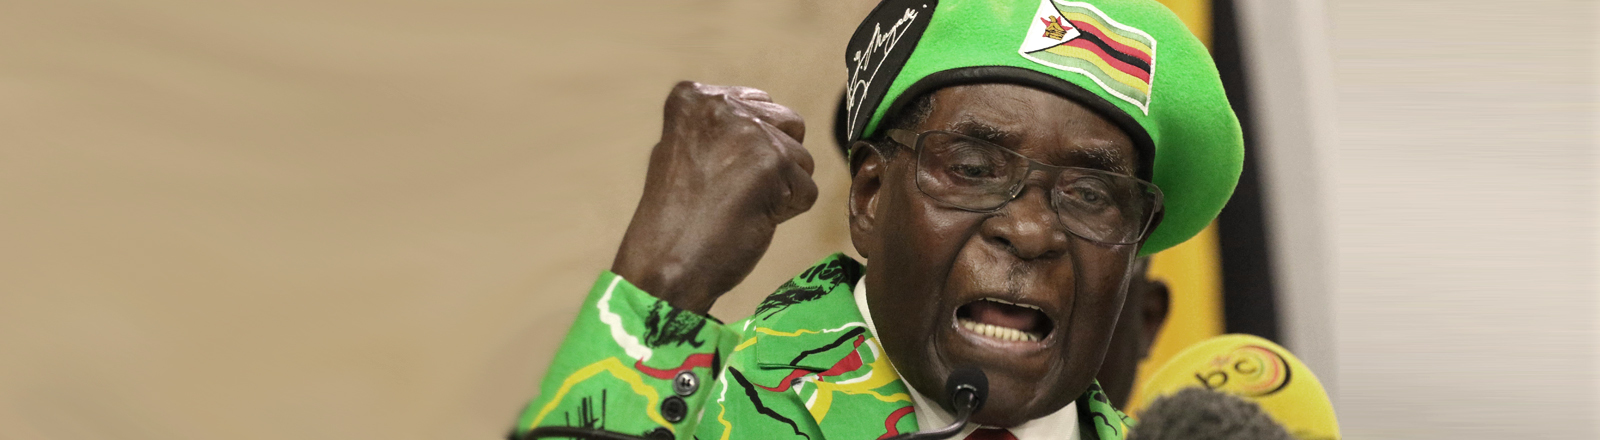 Robert Mugabe im Oktober 2017